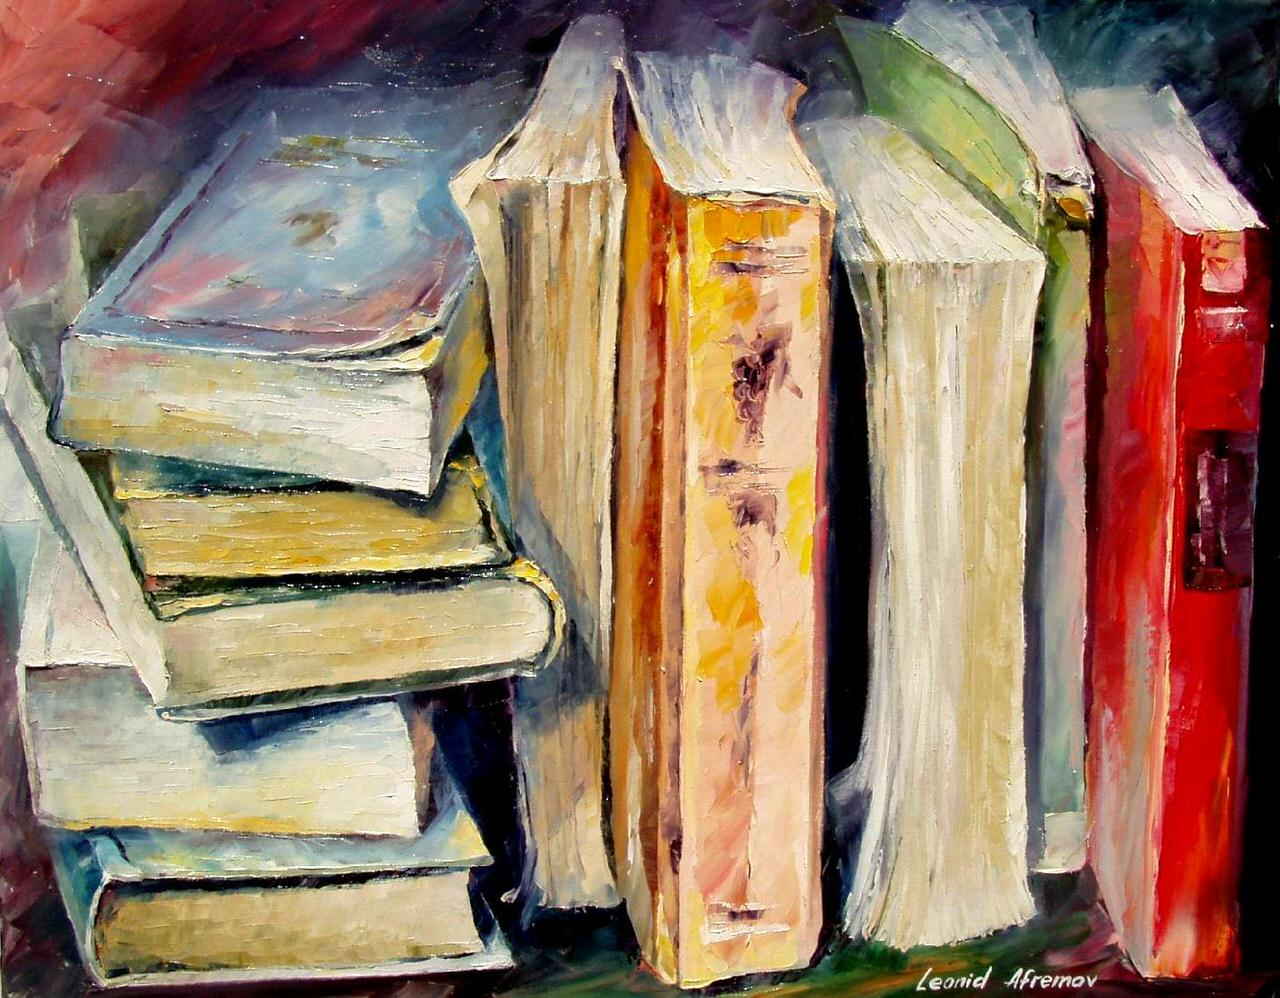 Gender-based Violence: 5 Books & Literature As Witnesses